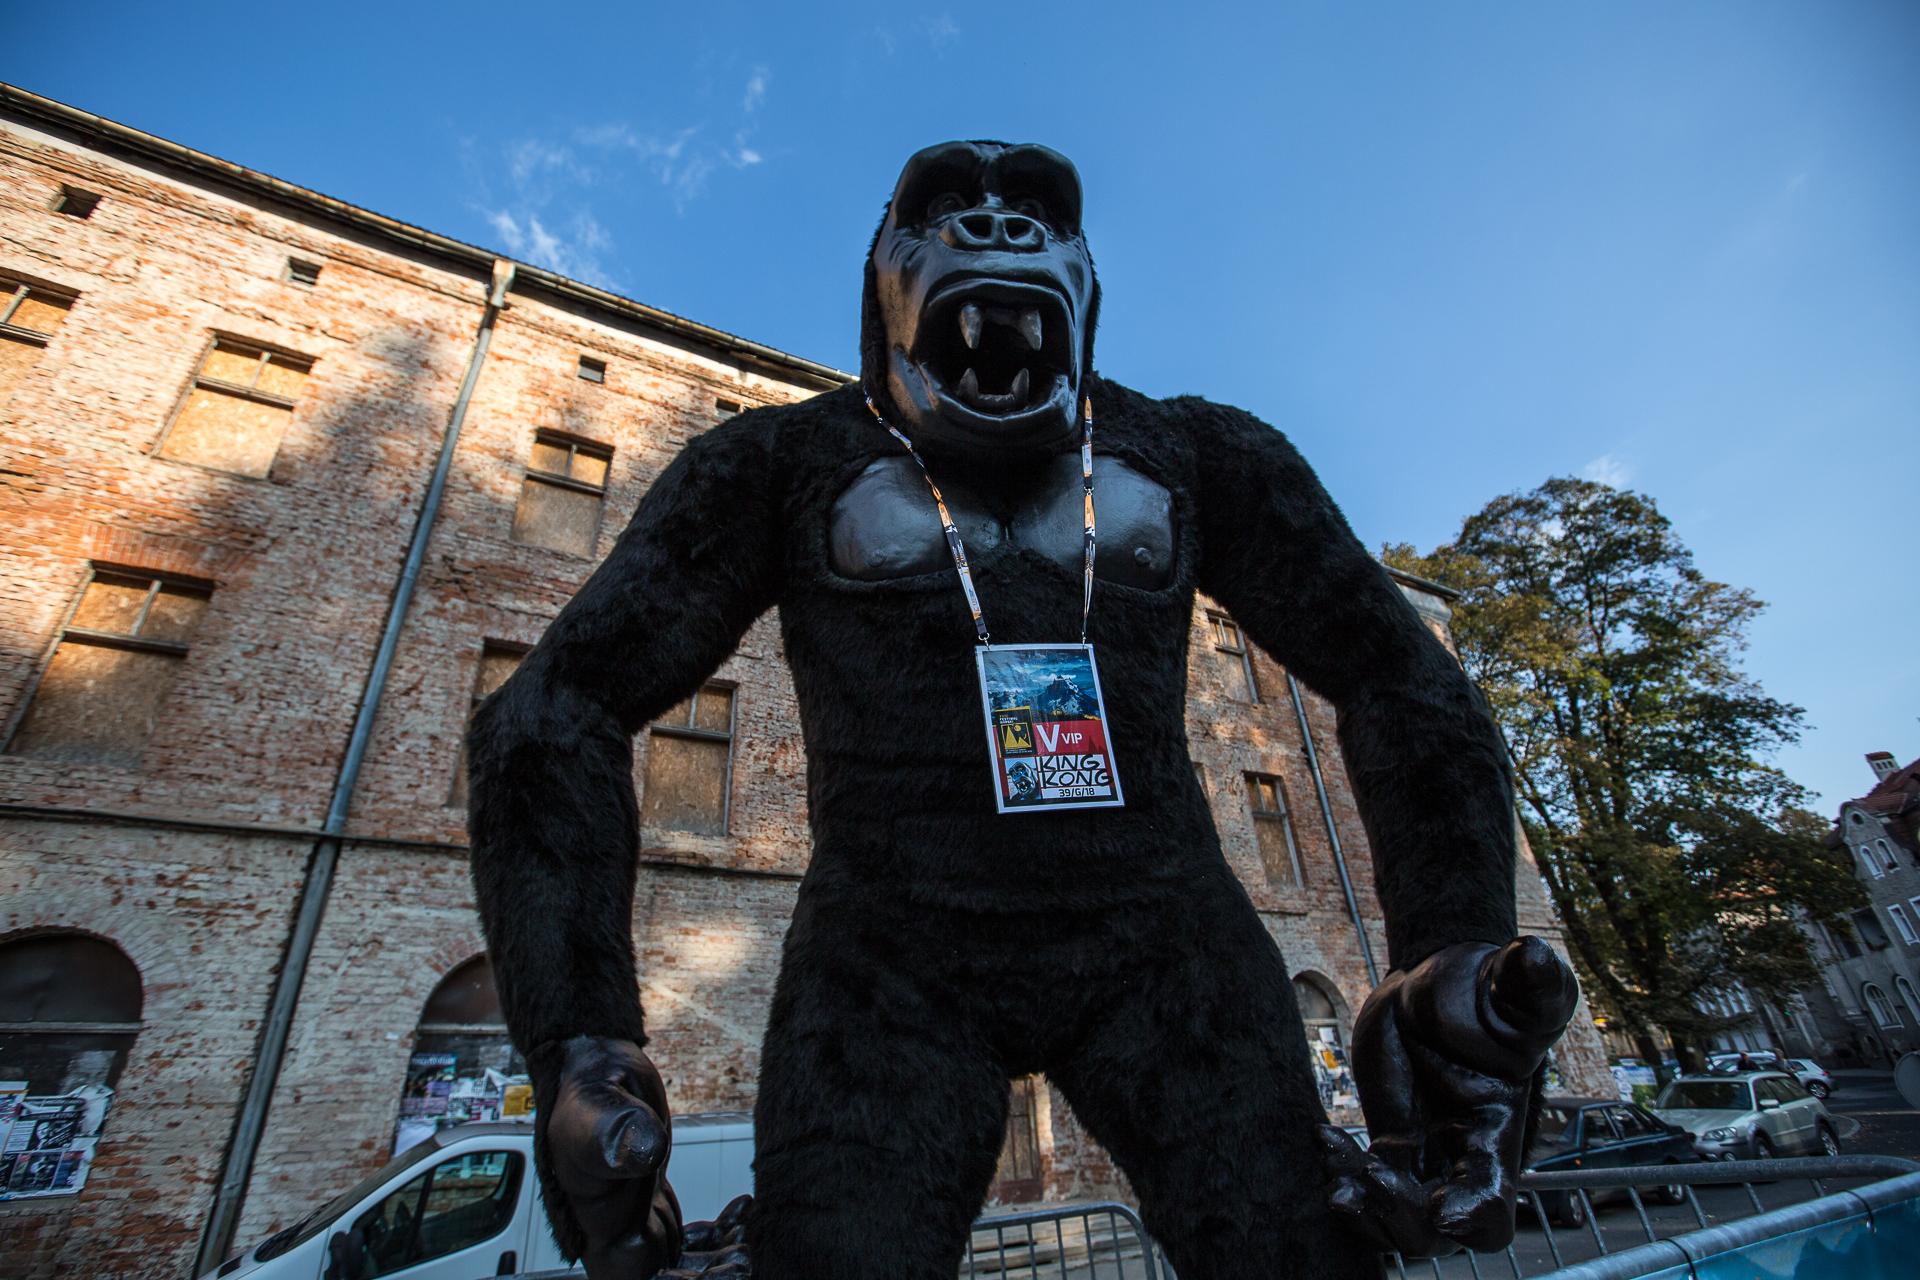 Festiwal Górski-King Kong